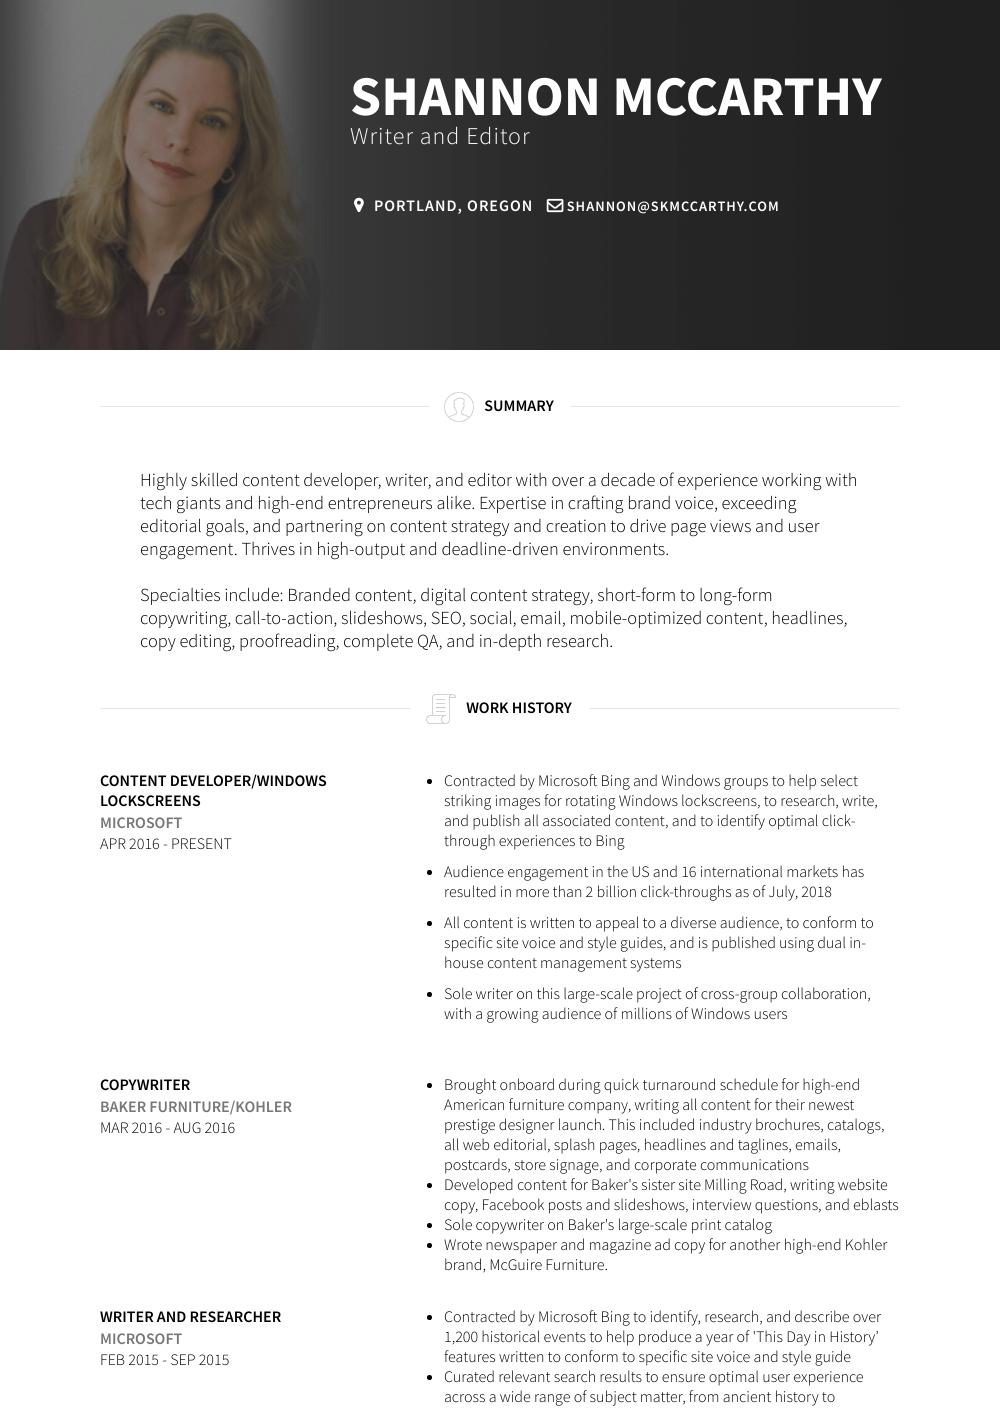 Copywriter Resume Samples & Templates VisualCV